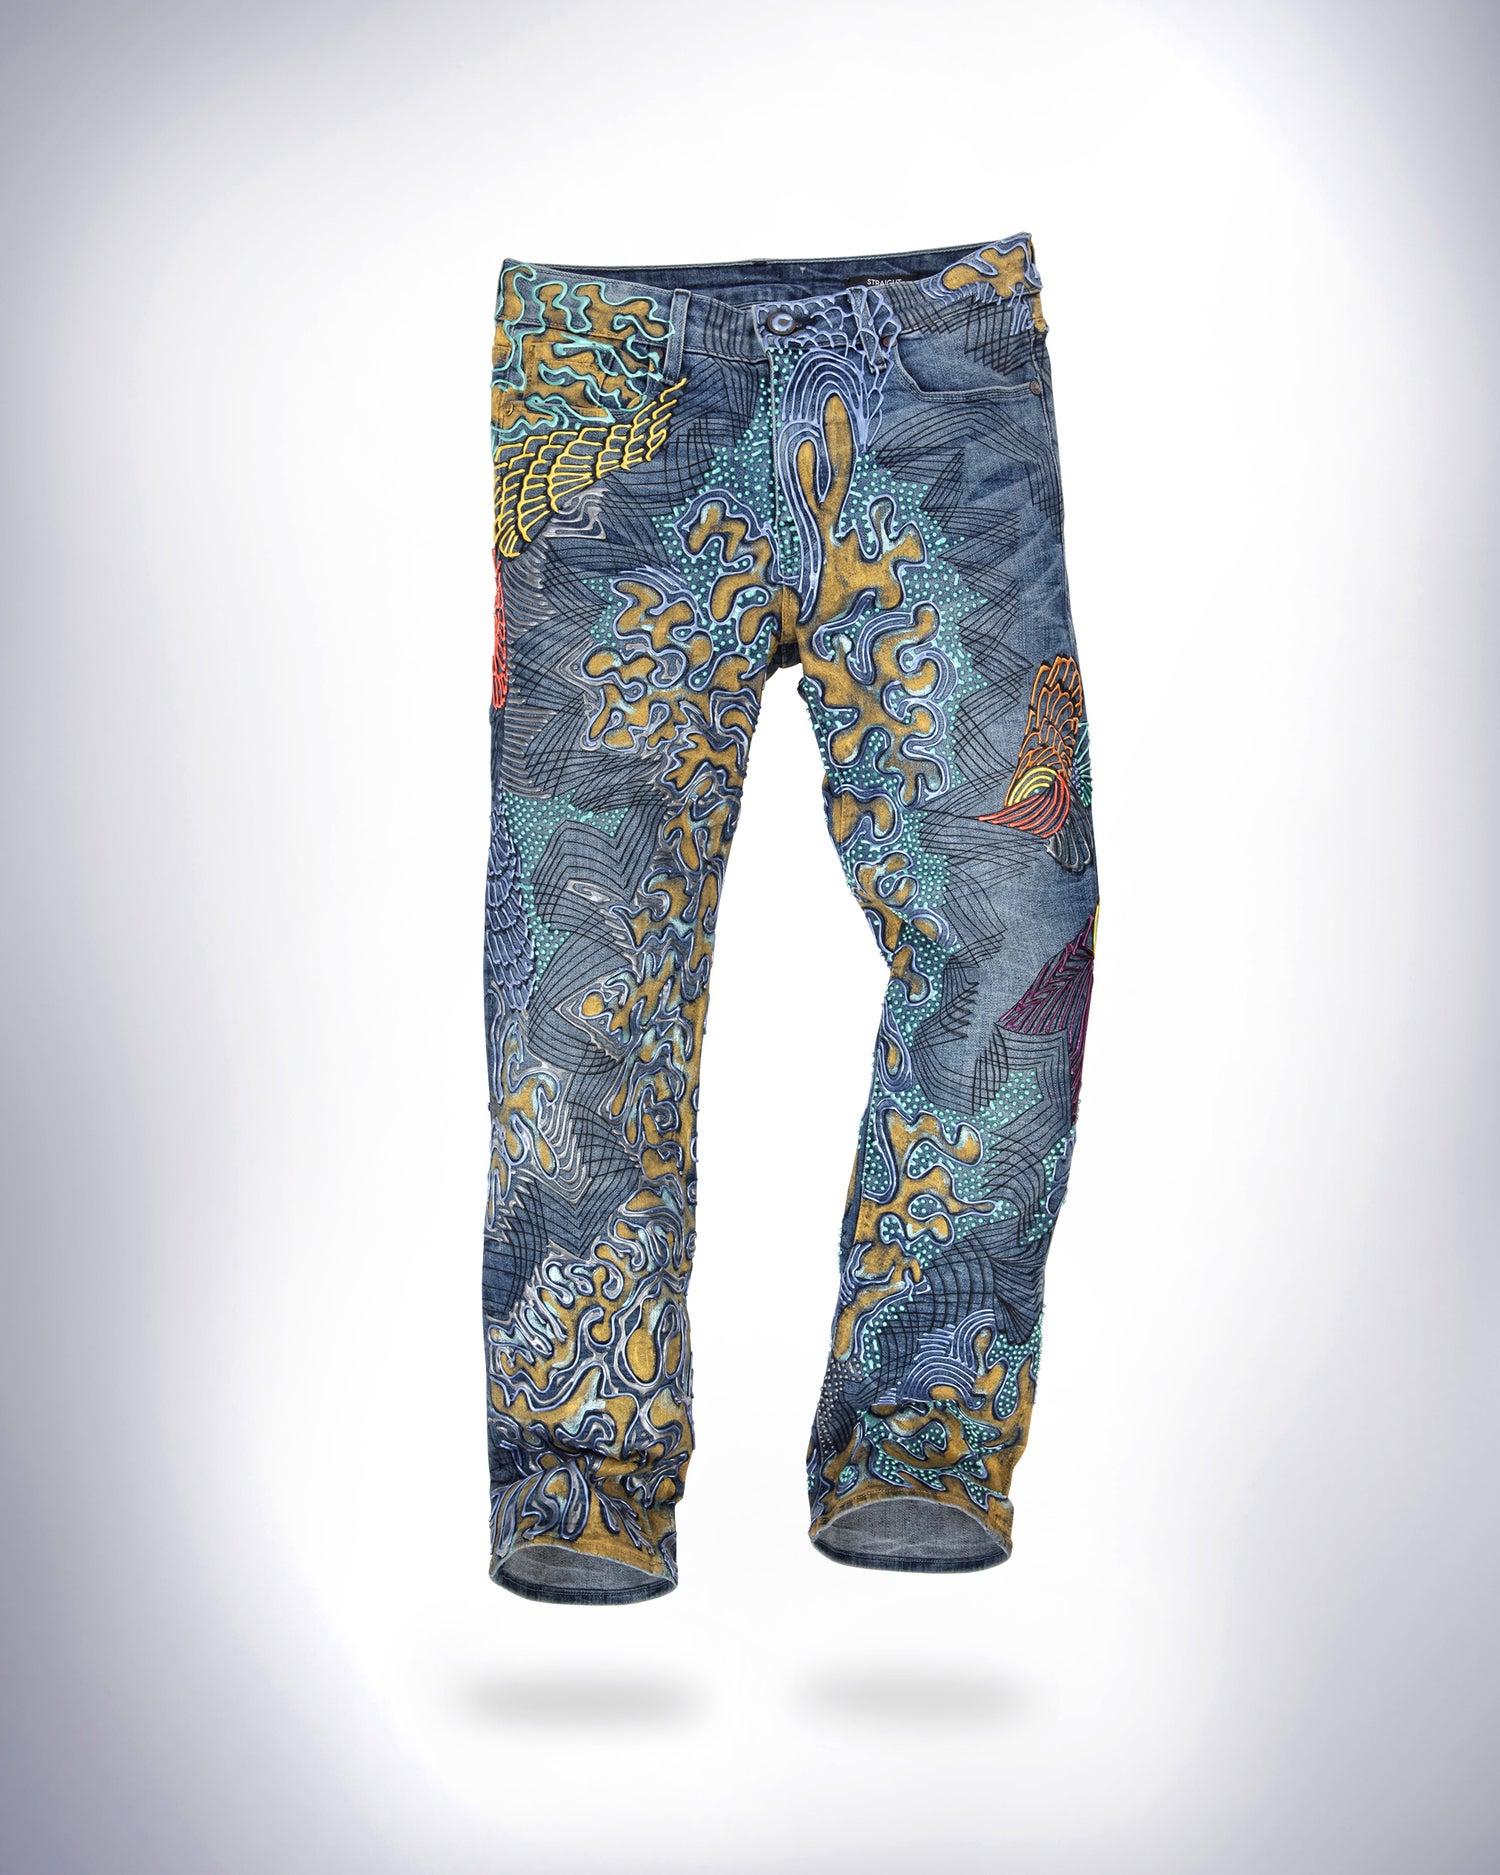 Image of Zoe Saldana's Jeans For Refugees